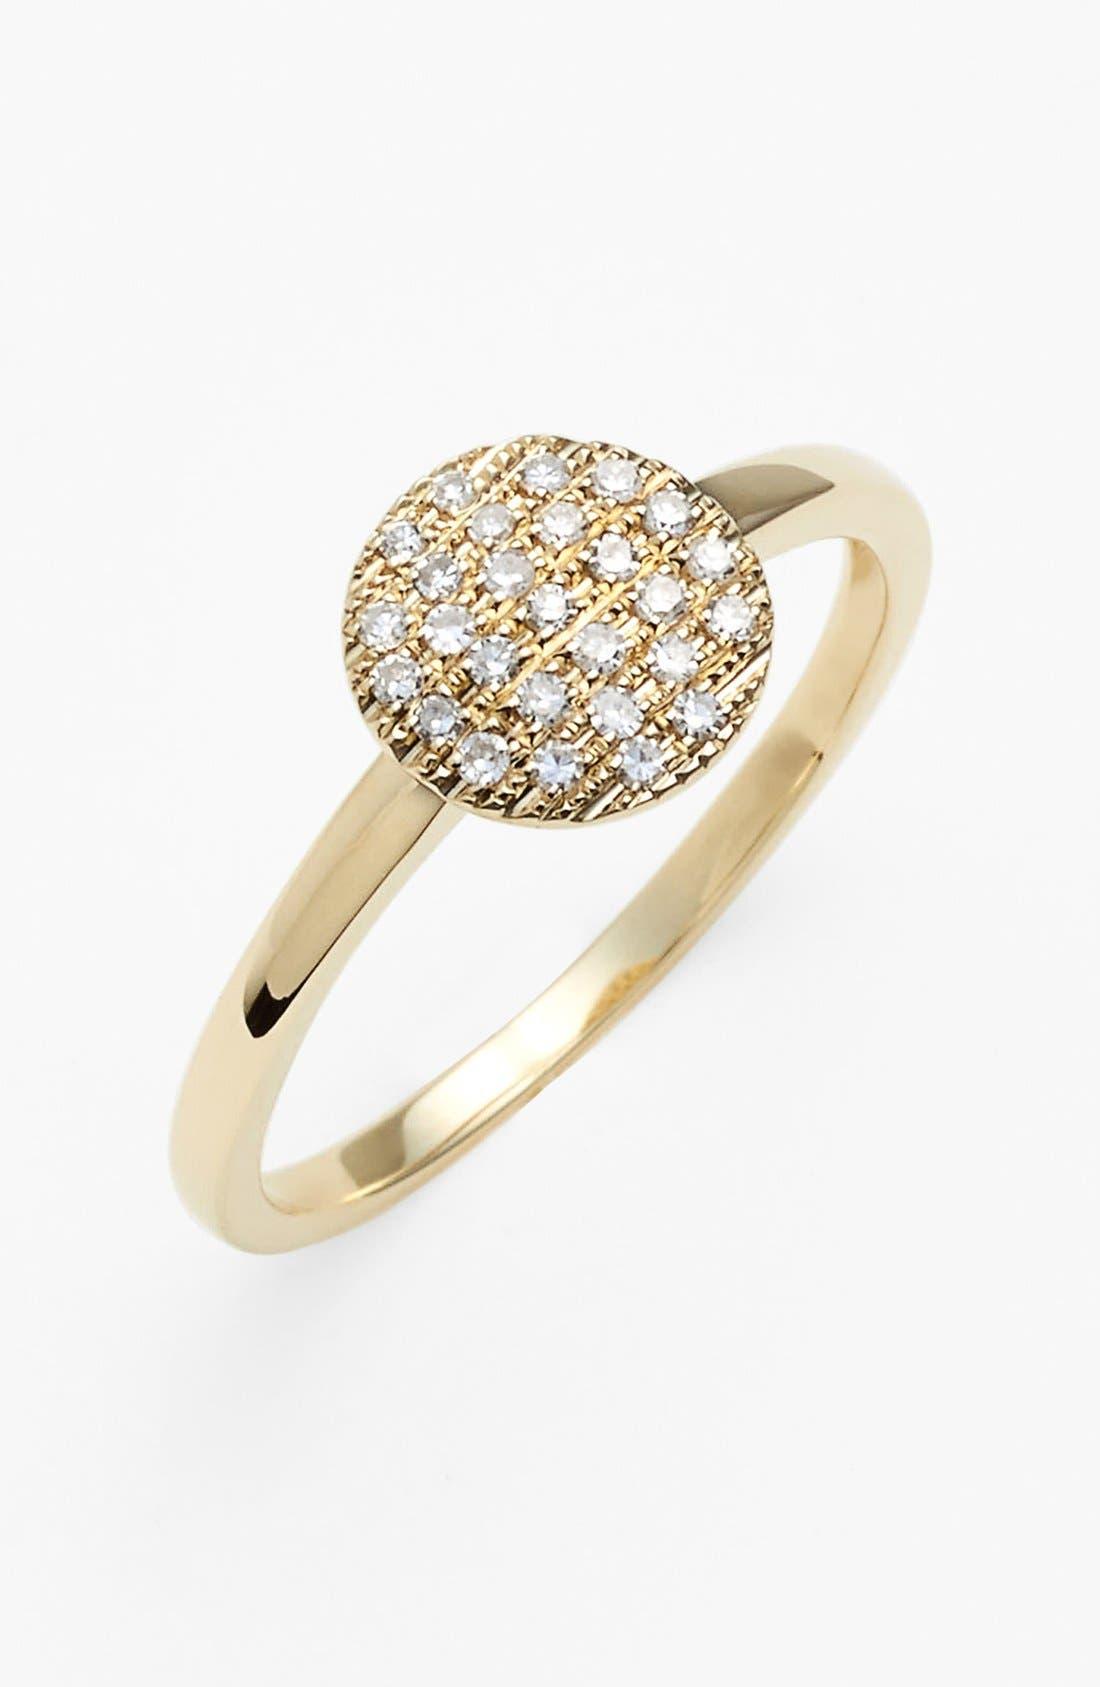 Alternate Image 1 Selected - Dana Rebecca Designs 'Lauren Joy' Diamond Ring